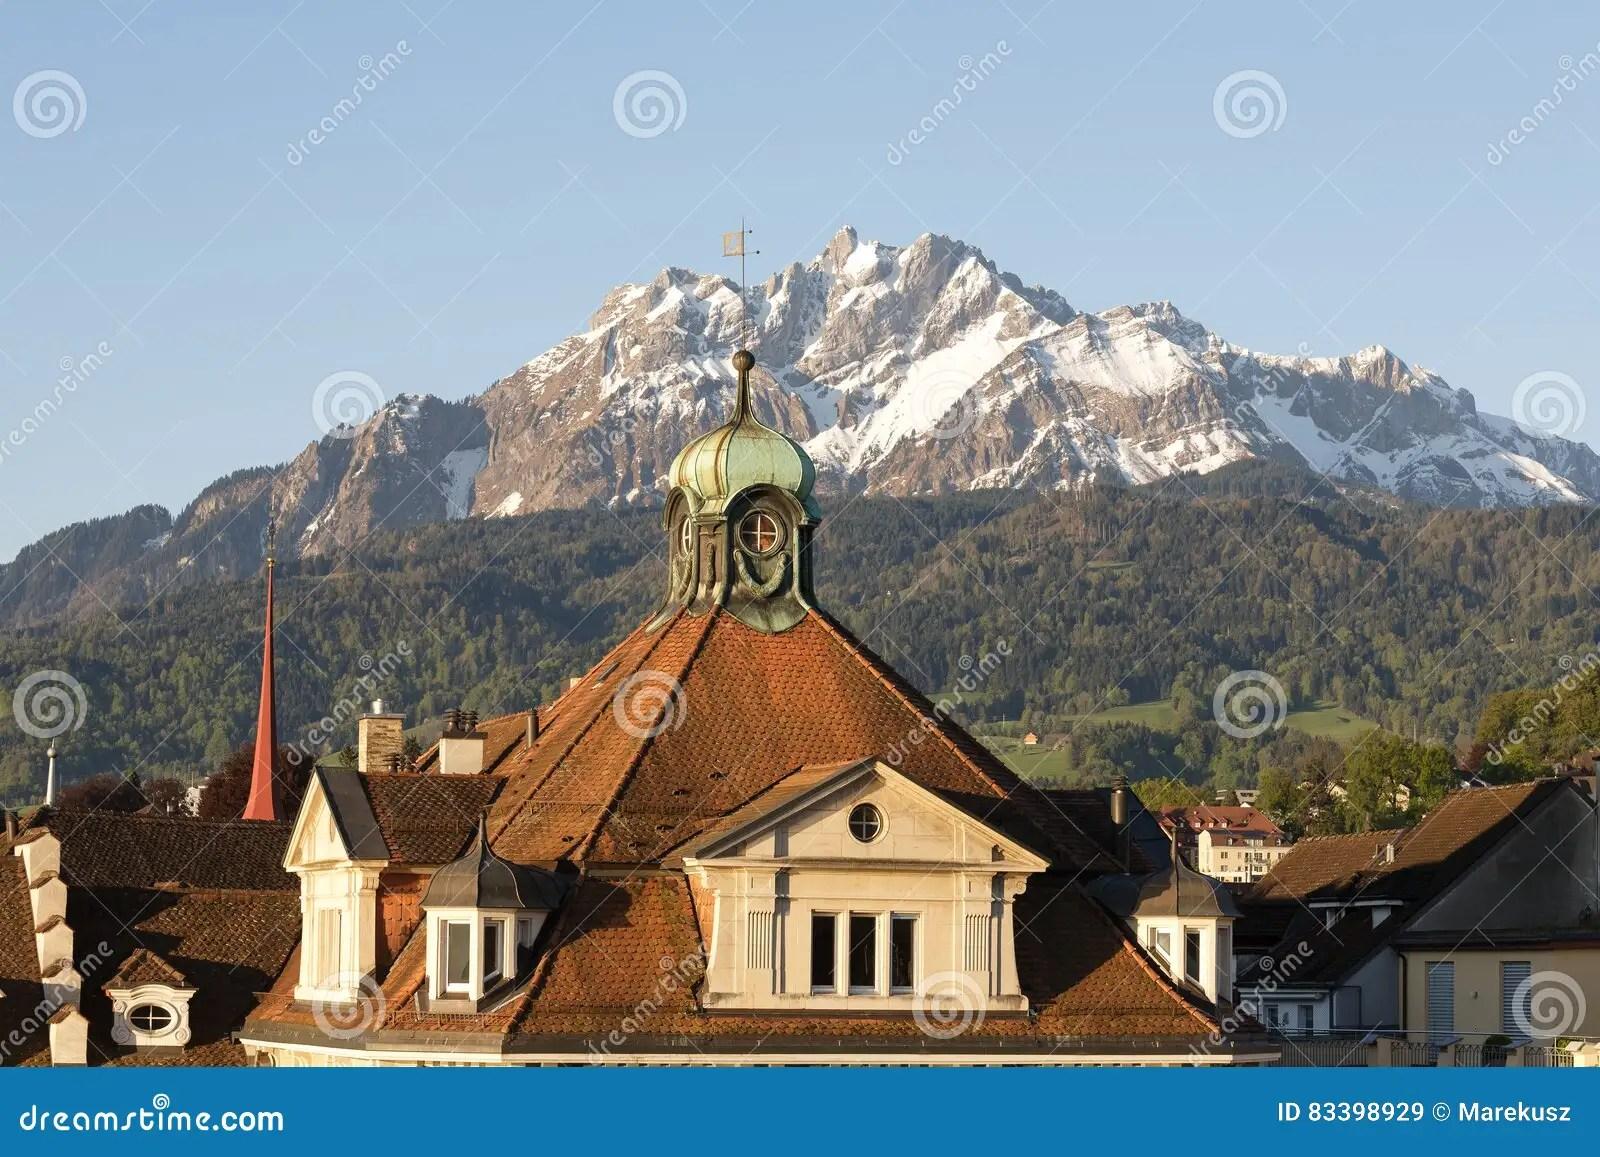 sloping roof and the pilatus peak editorial stock image image of tourist unique 83398929